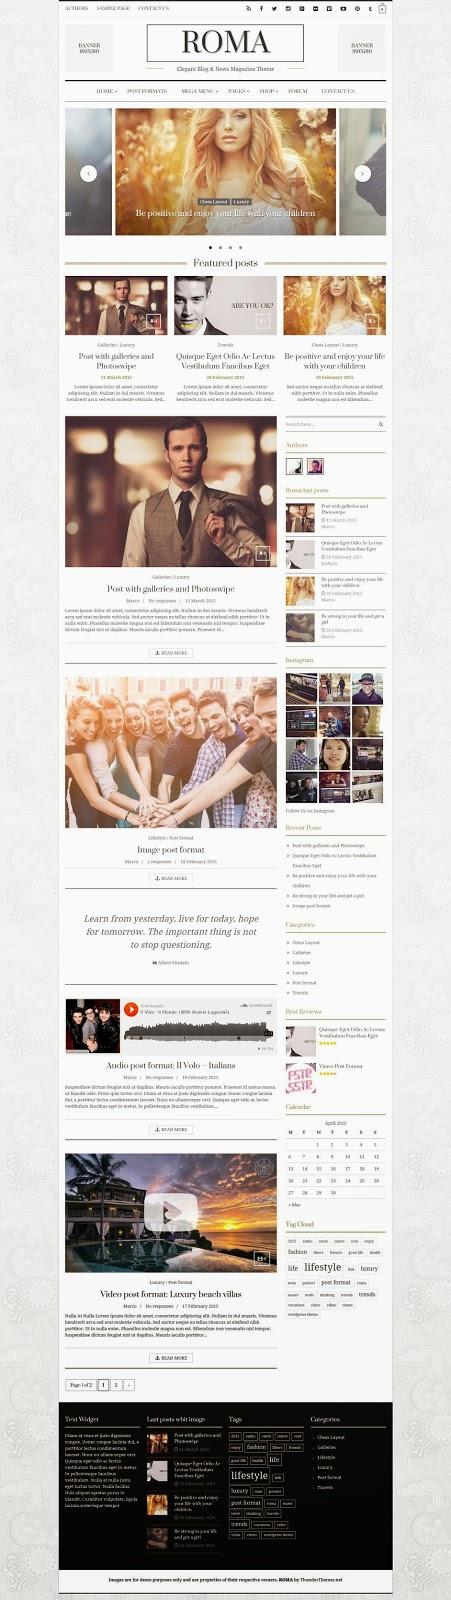 Responsive Blog News Magazine WordPress Theme 2015